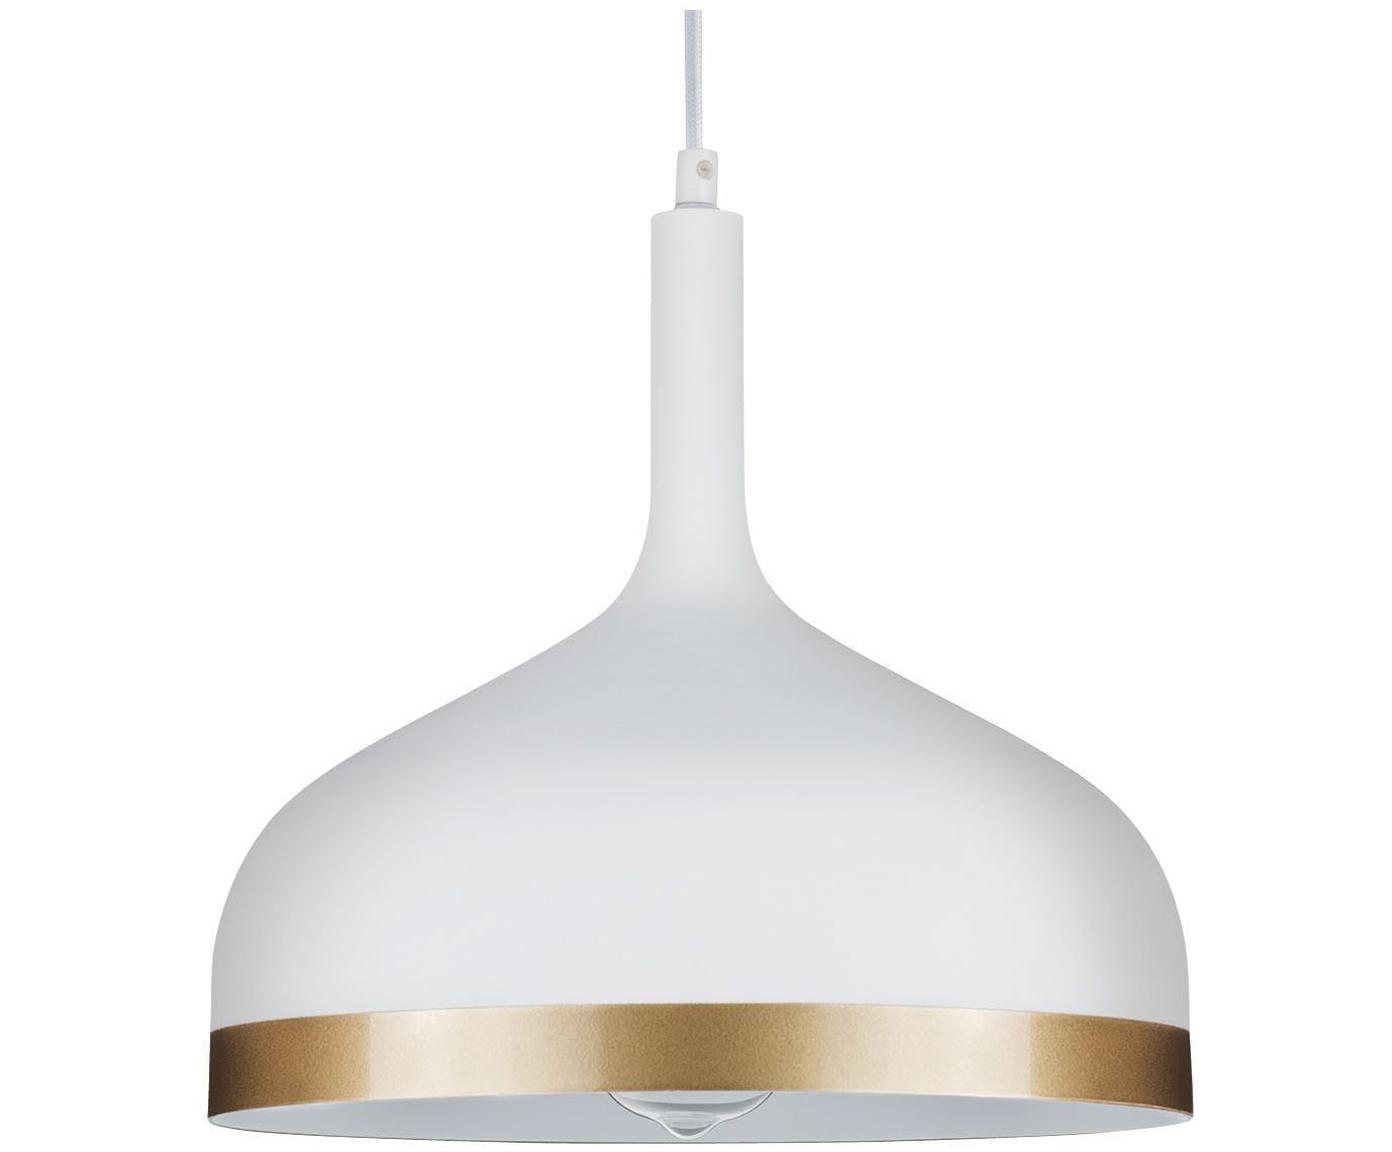 Hanglamp Embla, Wit, goudkleurig, Ø 30 x H 28 cm